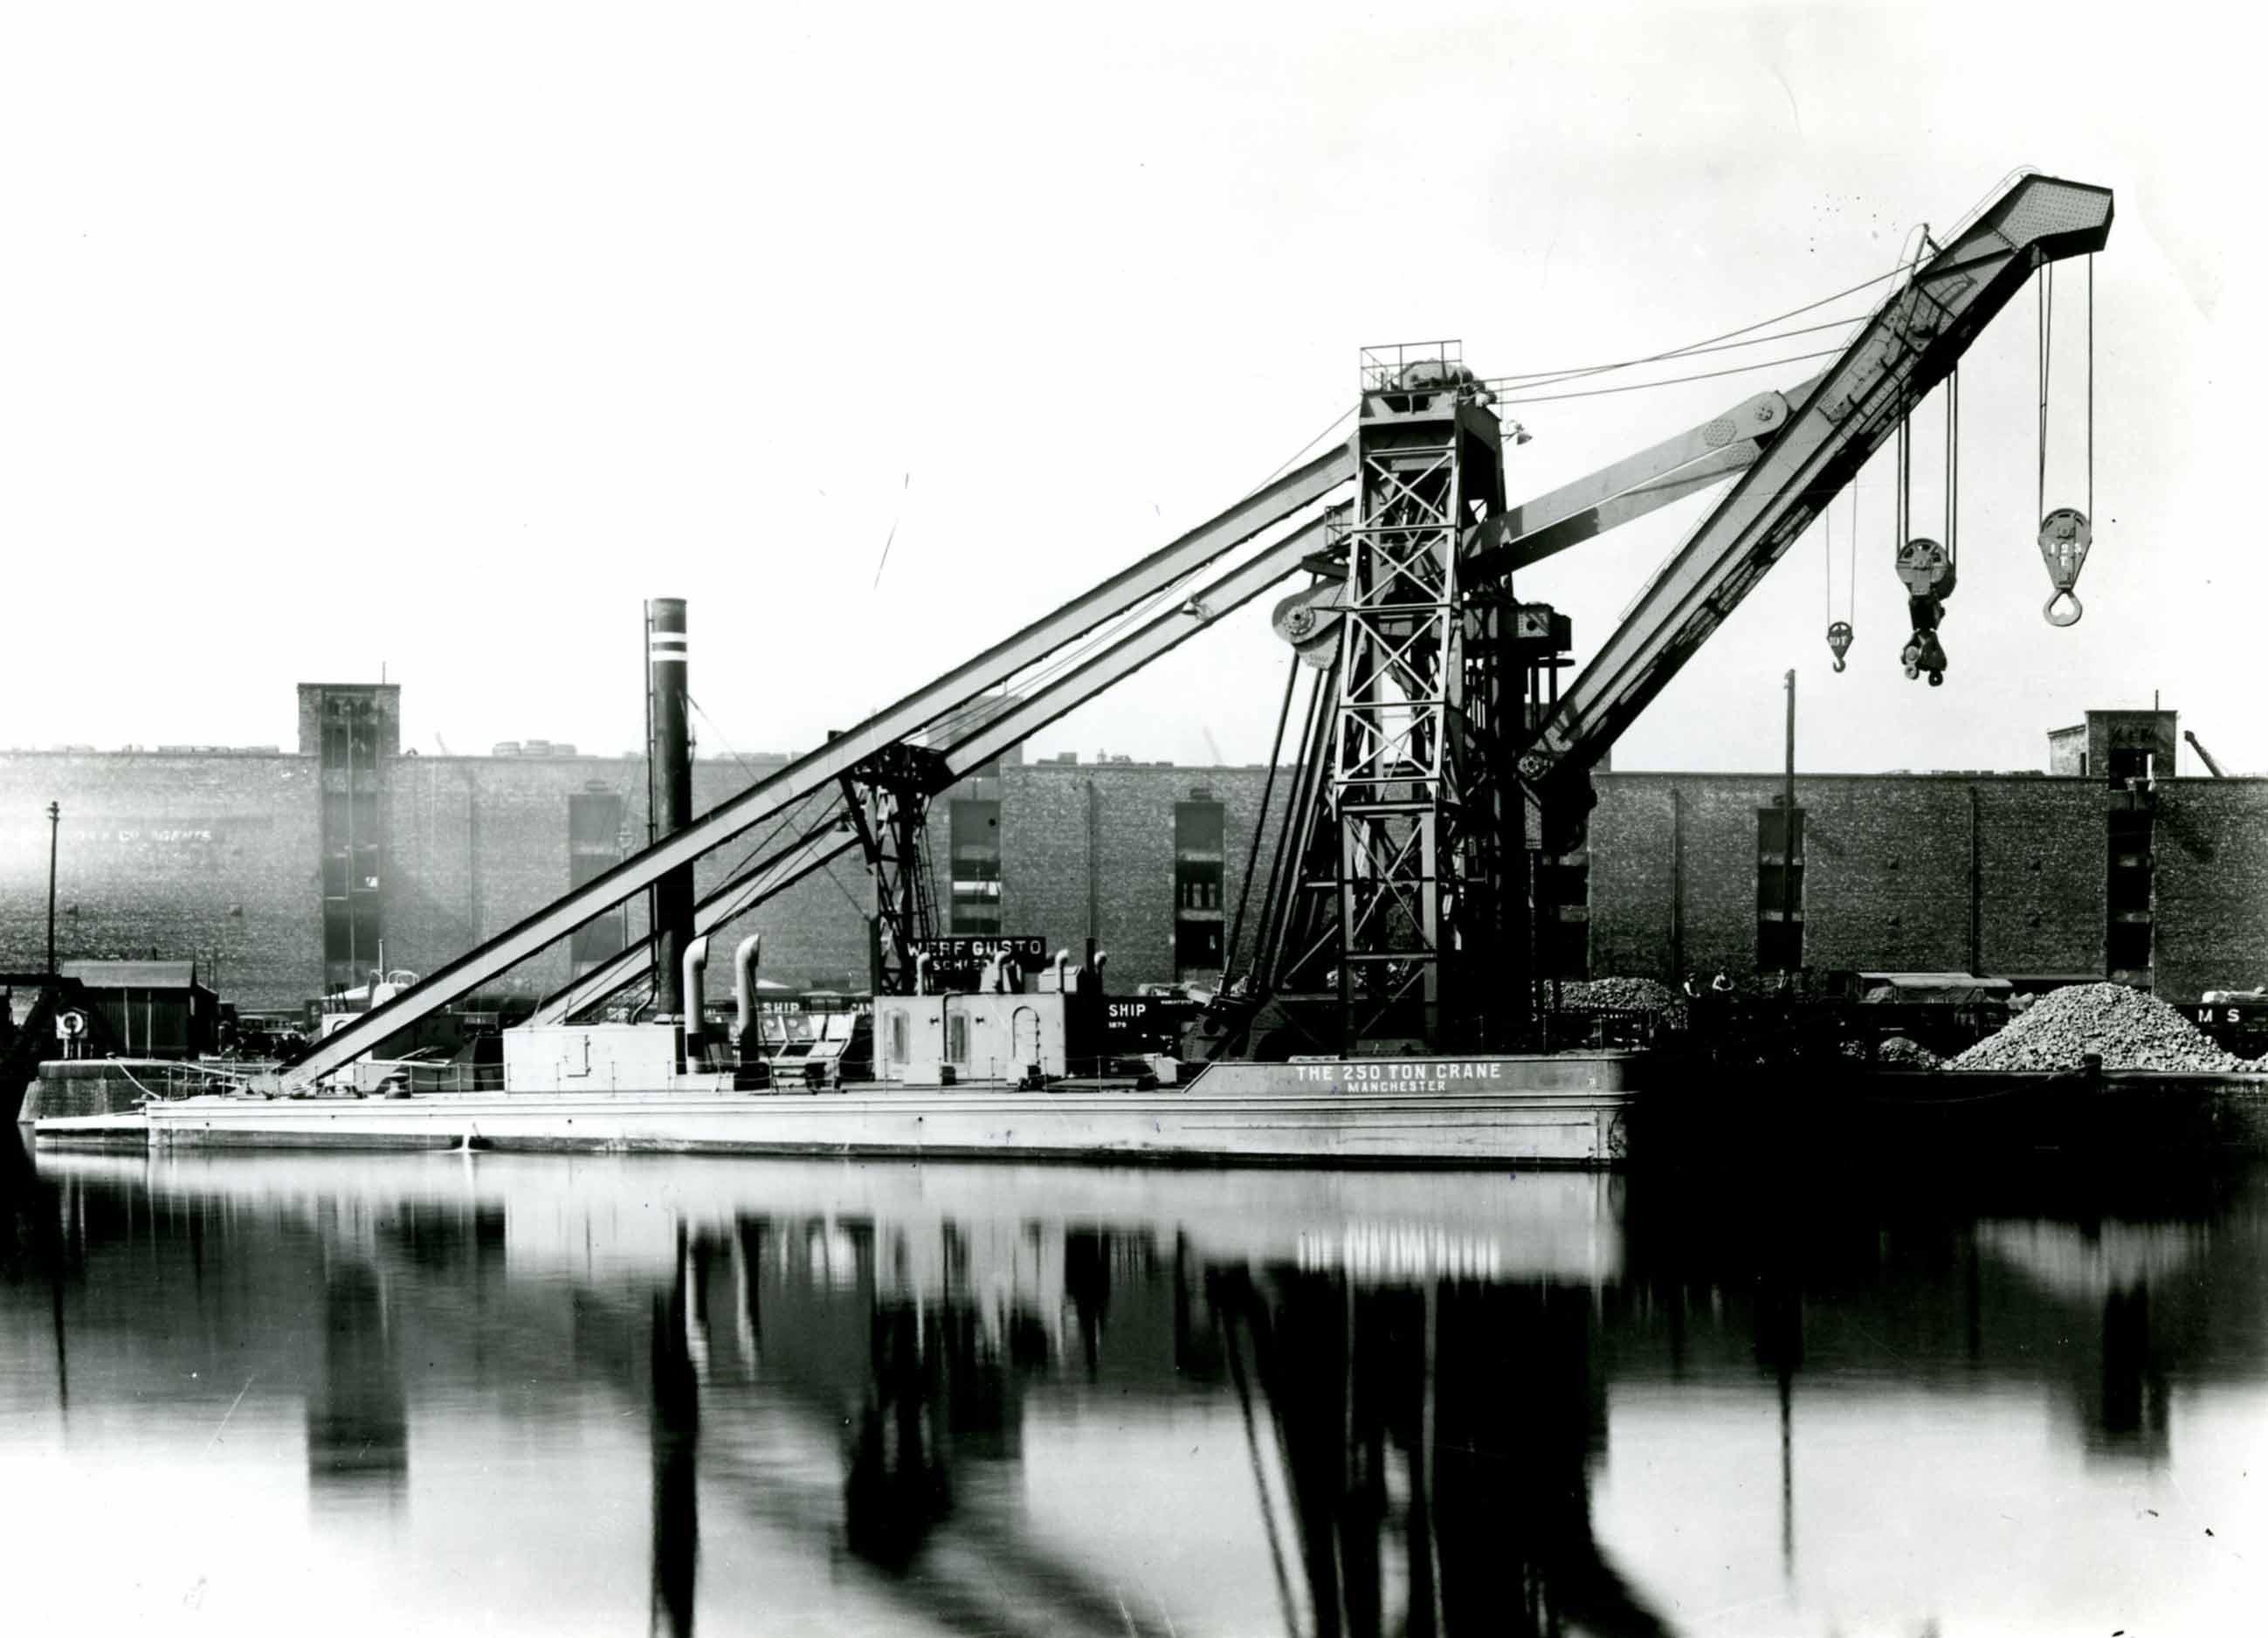 Bnr. 716: The 250 Ton Crane (1937)